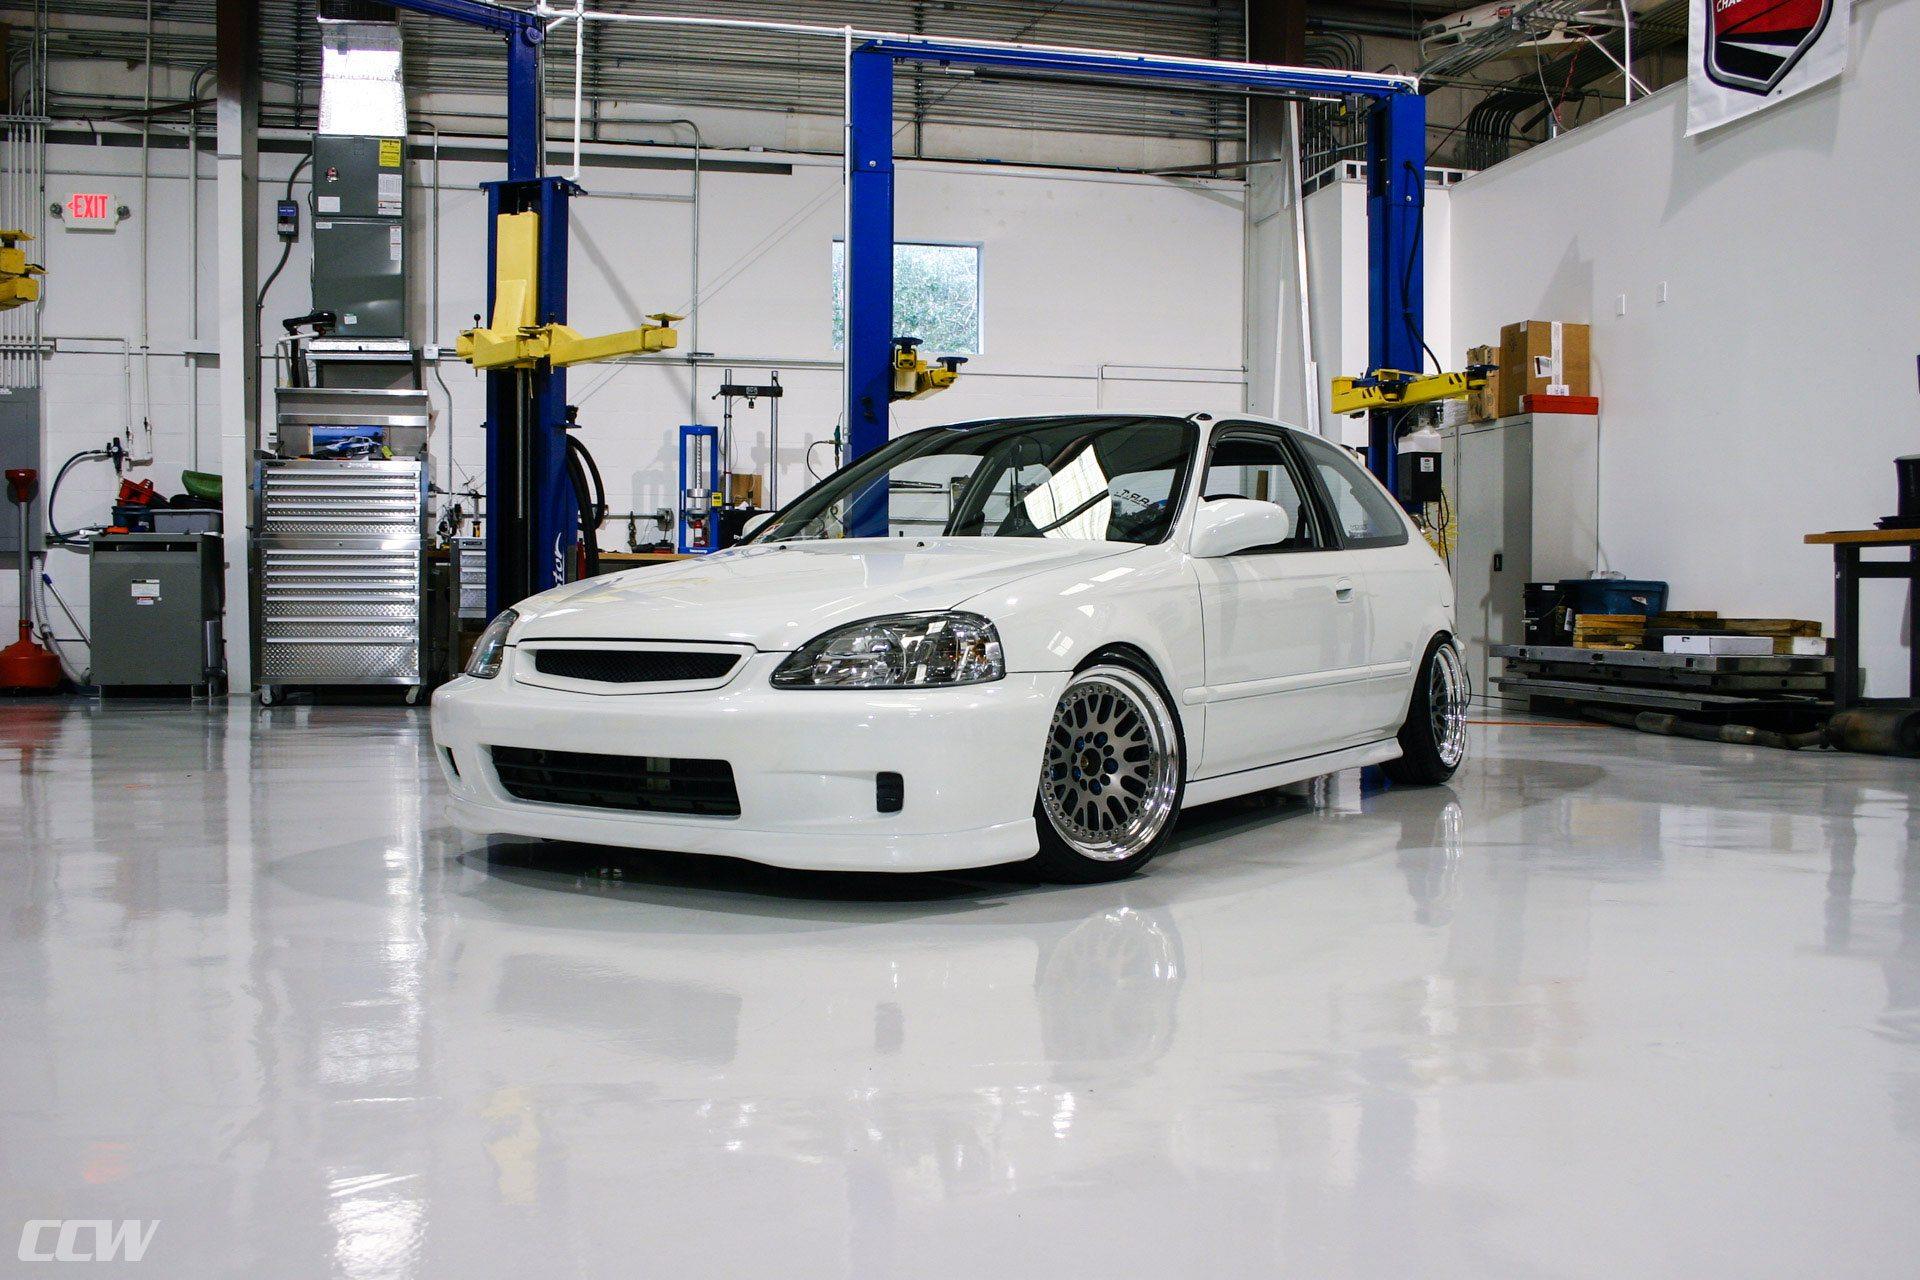 White Ek Hatch Posted By Ryan Mercado